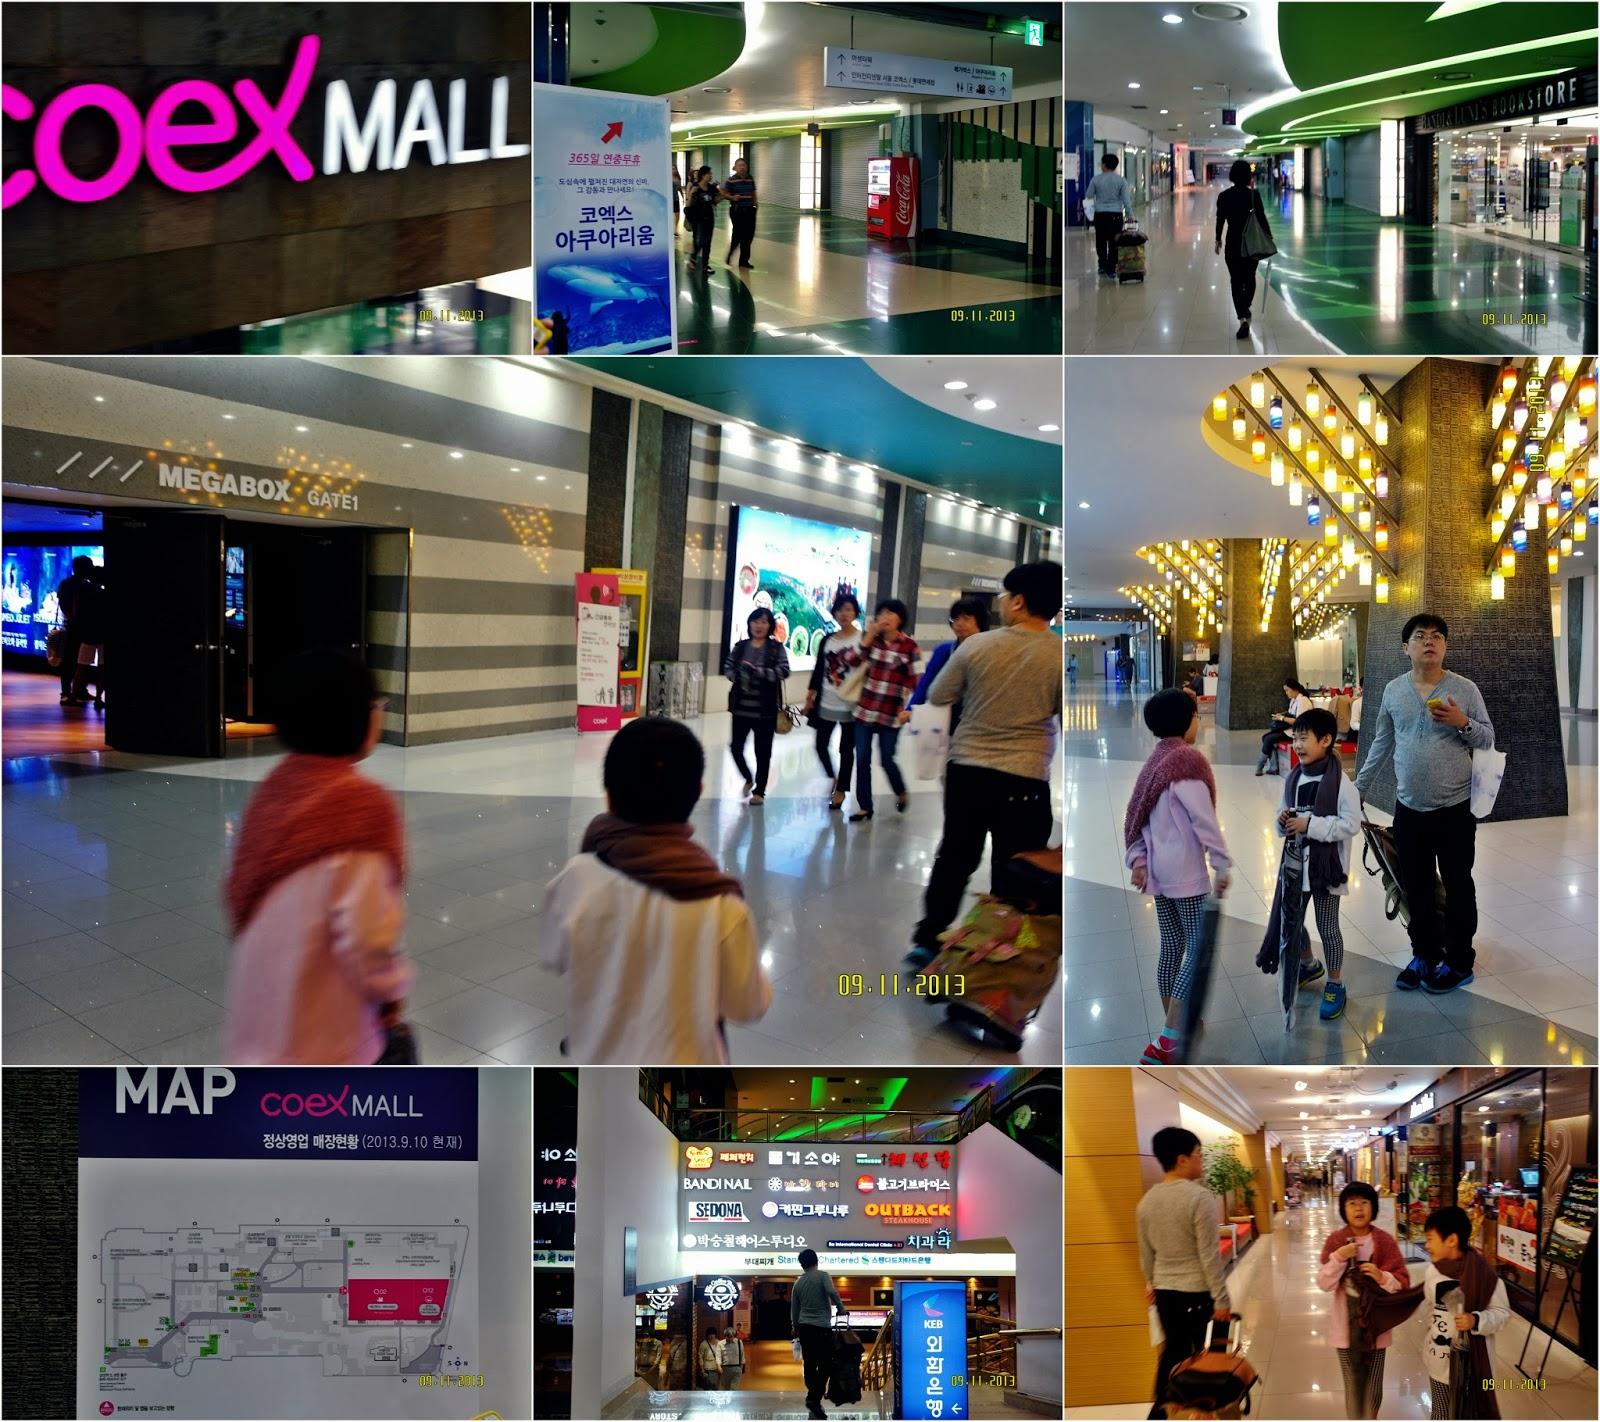 Meheartseoul sweet memories September in 3G Gangnam